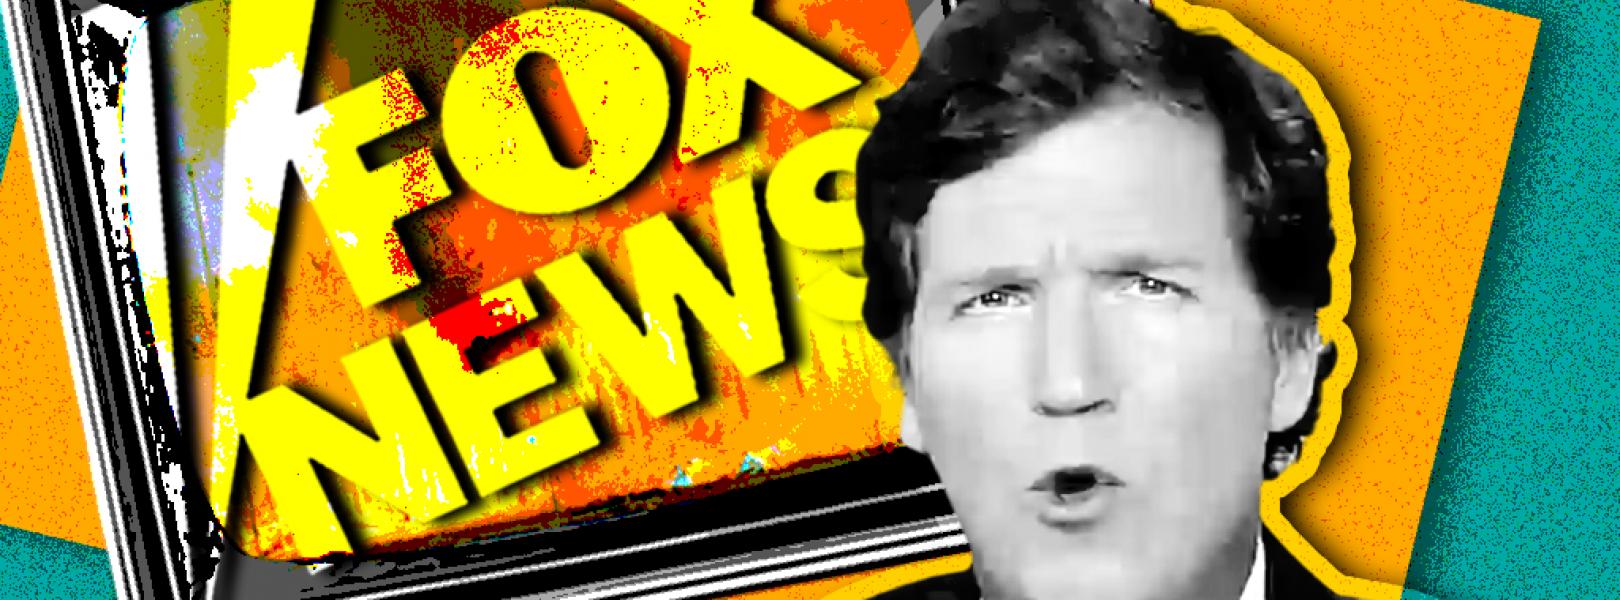 Fox-Wildfires-Climate-Deny-Downplay